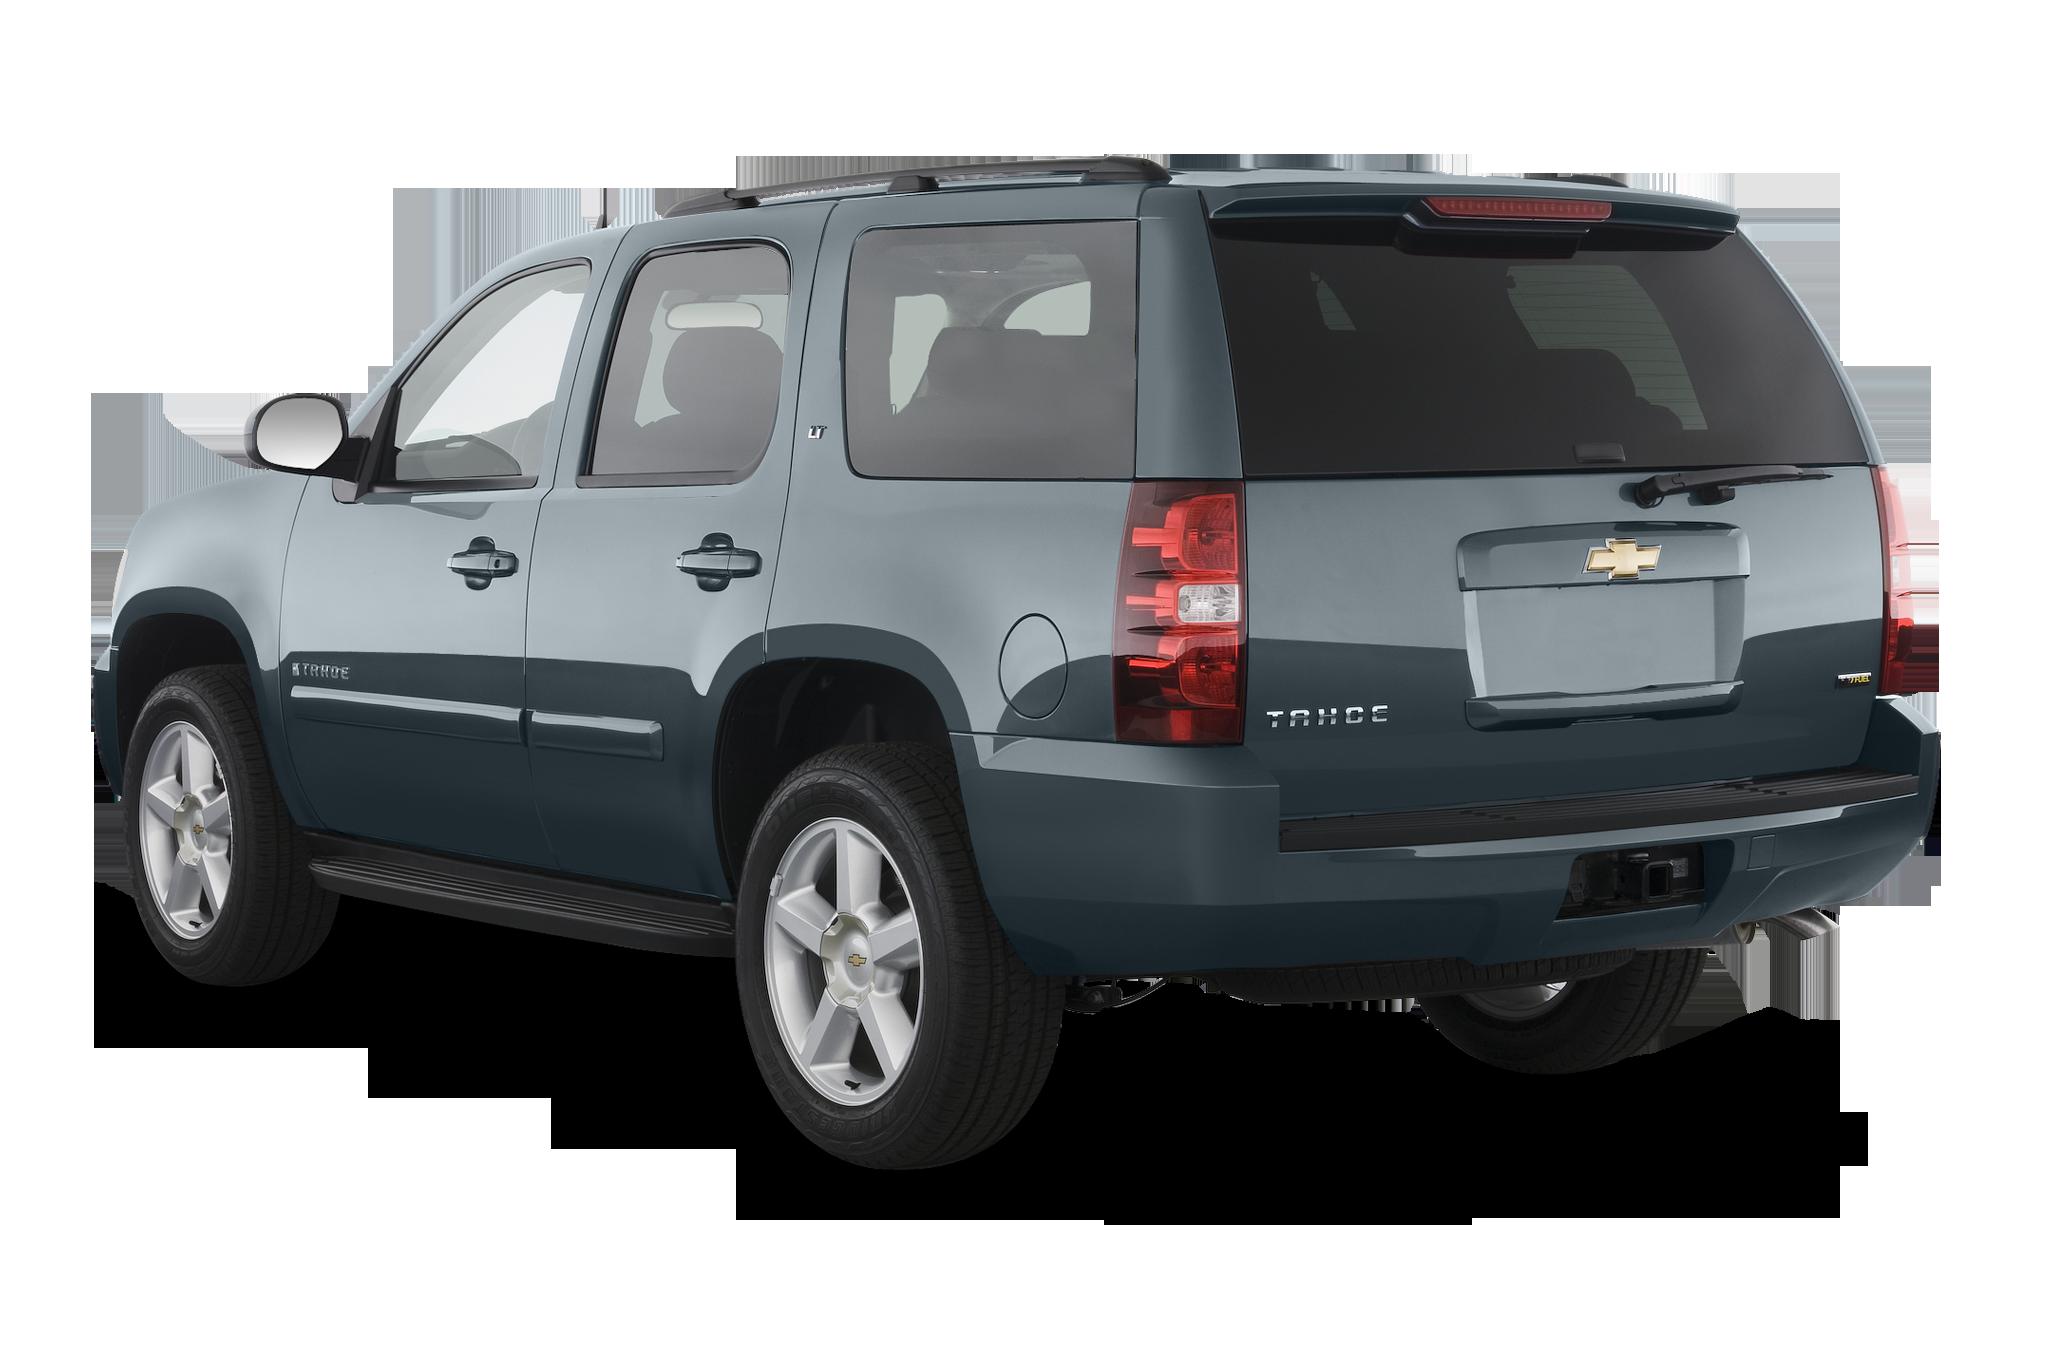 2014 Ford Escape Mpg >> 2015 GMC Yukon, Chevrolet Tahoe Spotted Testing